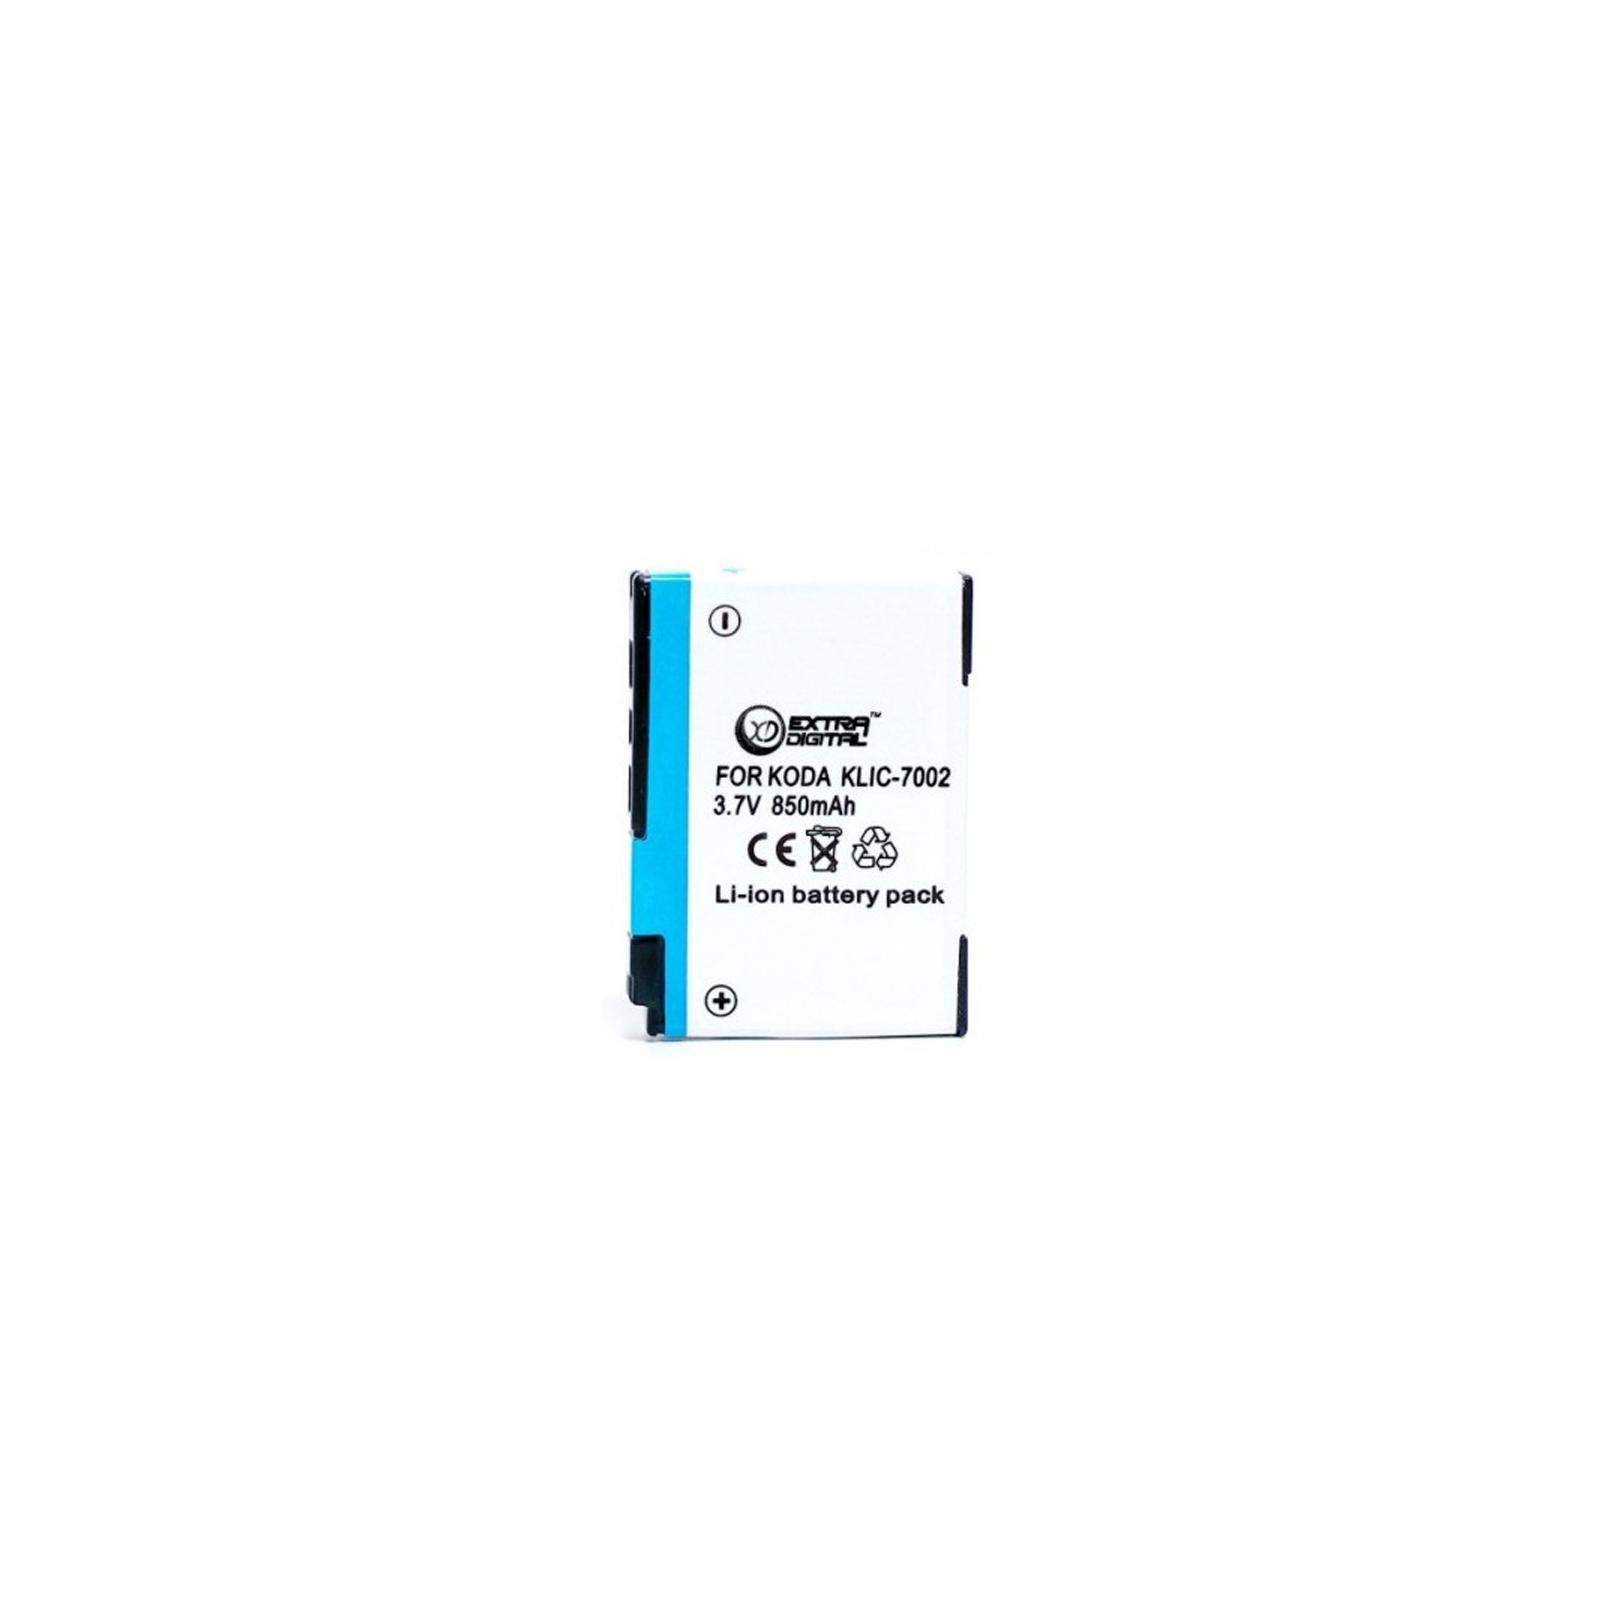 Аккумулятор к фото/видео EXTRADIGITAL Kodak KLIC-7002 (DV00DV1154)